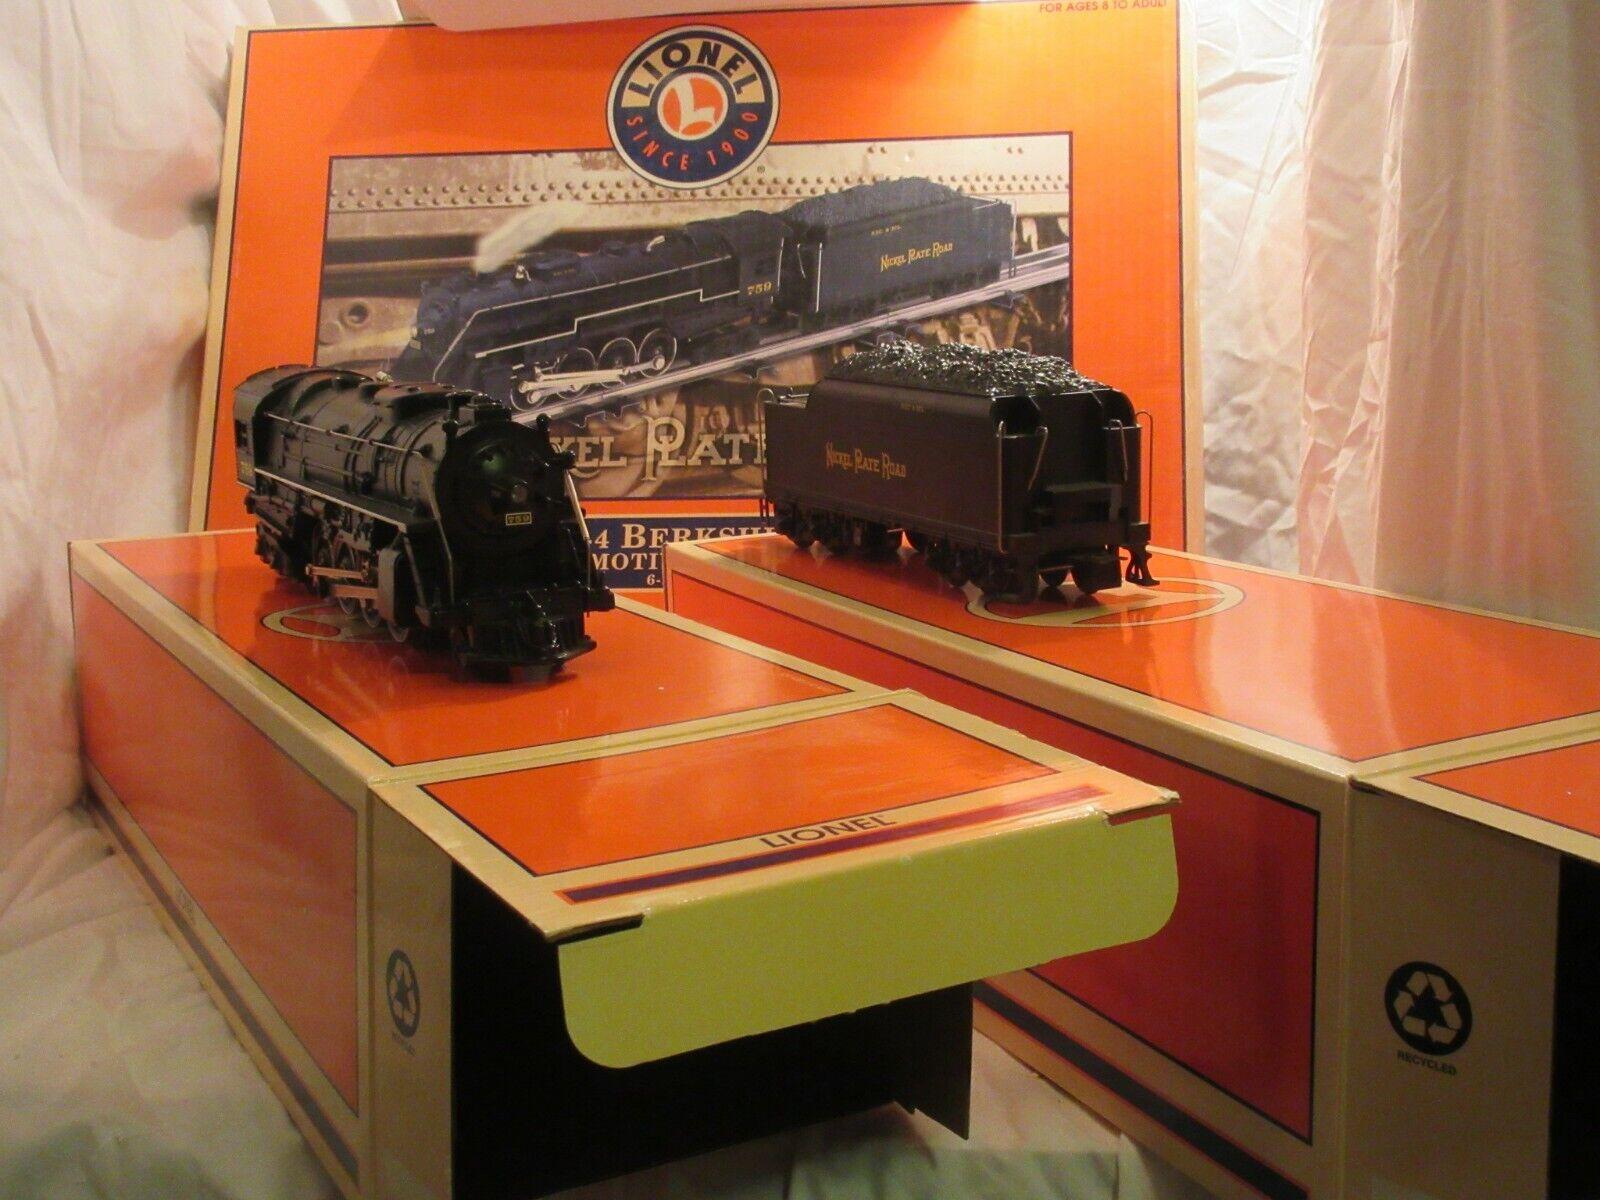 Lionel 28074 Nickel Plate Road 759 O Gauge Berkshire Steam Engine and Tender